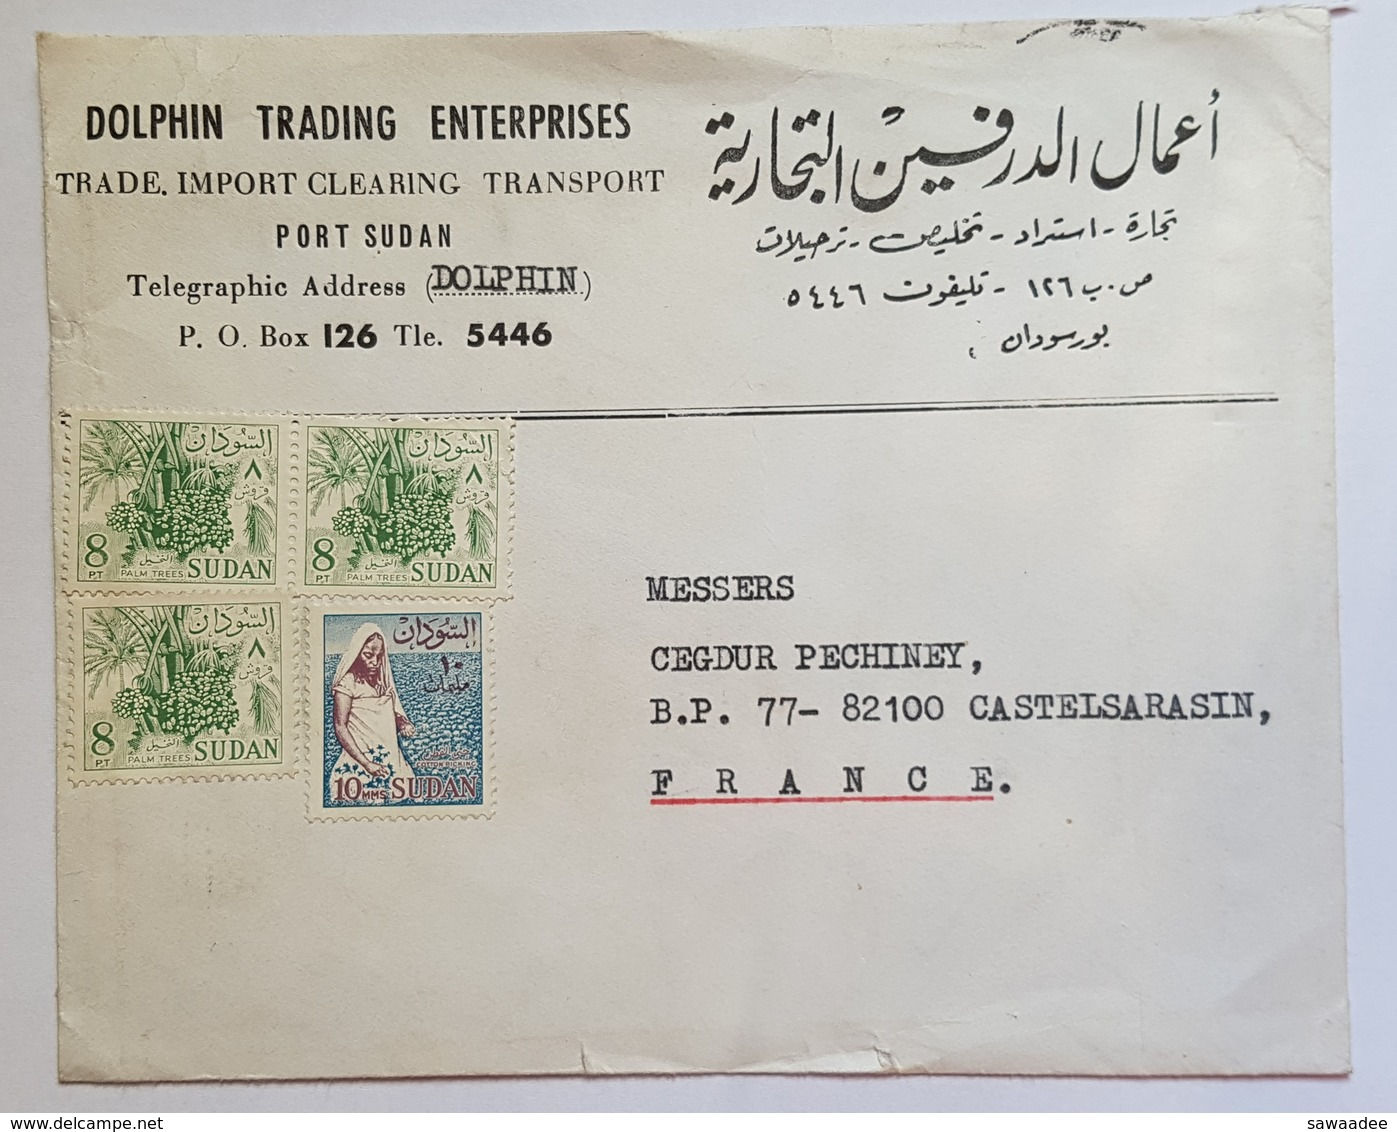 ENVELOPPE - PORT SOUDAN - DOLPHIN TRADING ENTERPRISES - PECHINEY - ANNEE 70 - BILINGUE - Soudan (1954-...)